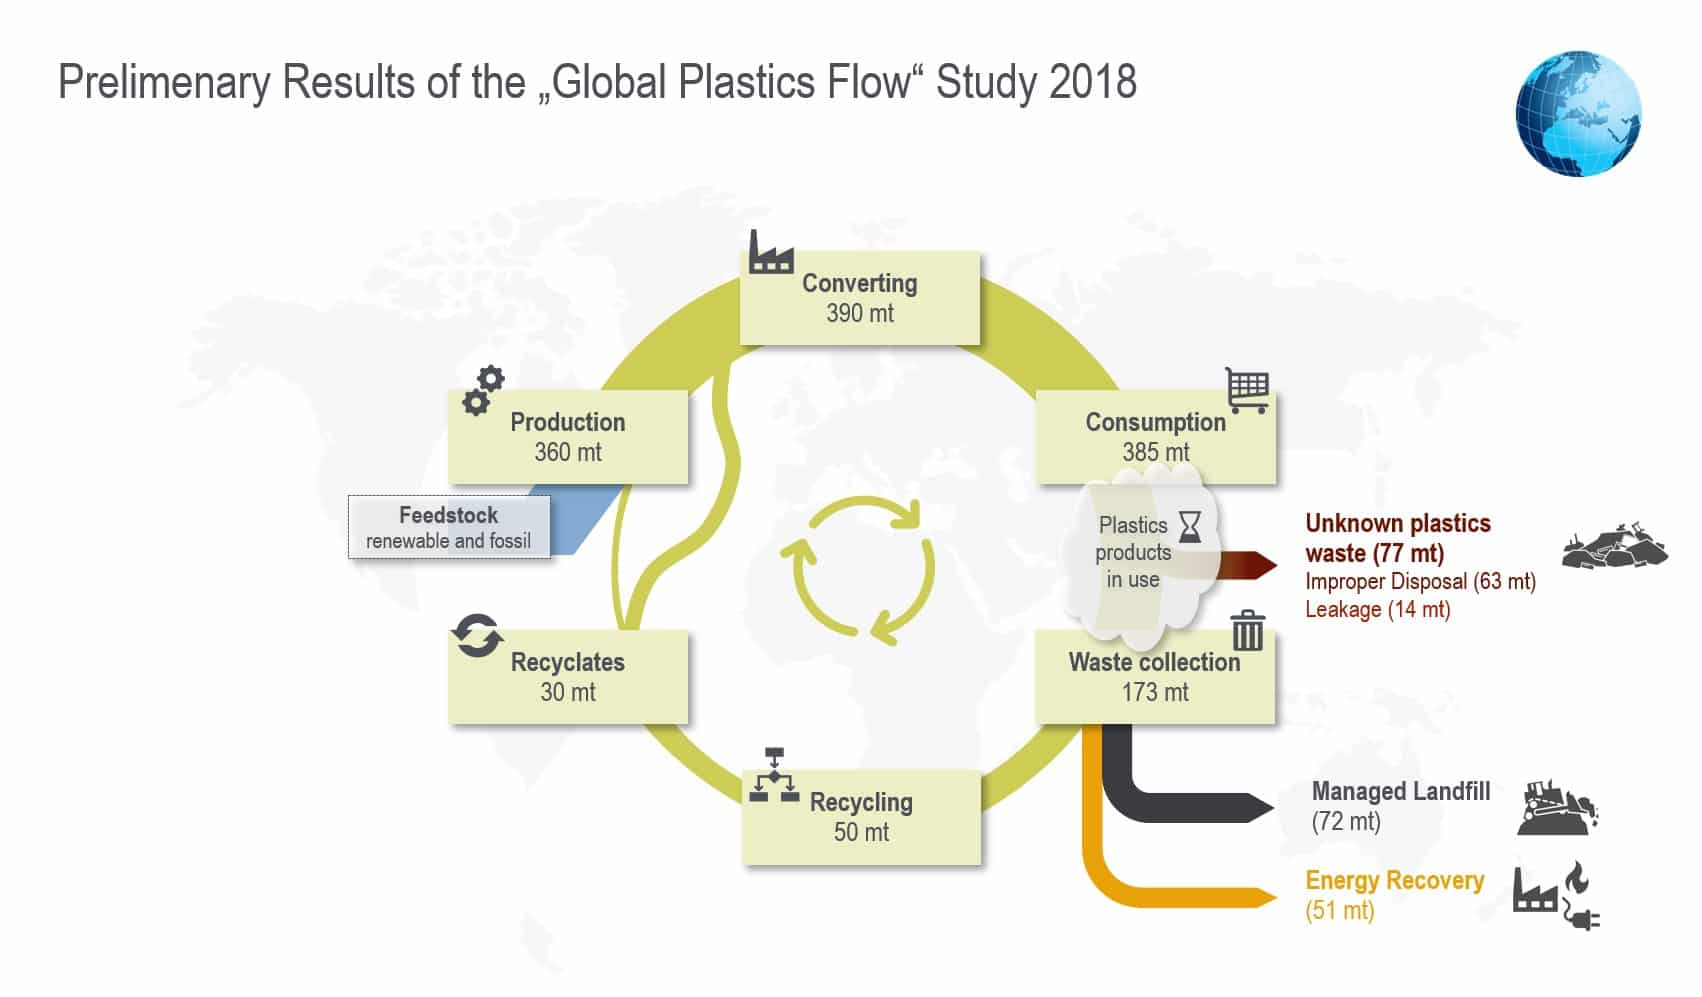 Prelimenary Results Global Plastics Flow Study 2018 - Circular Economy